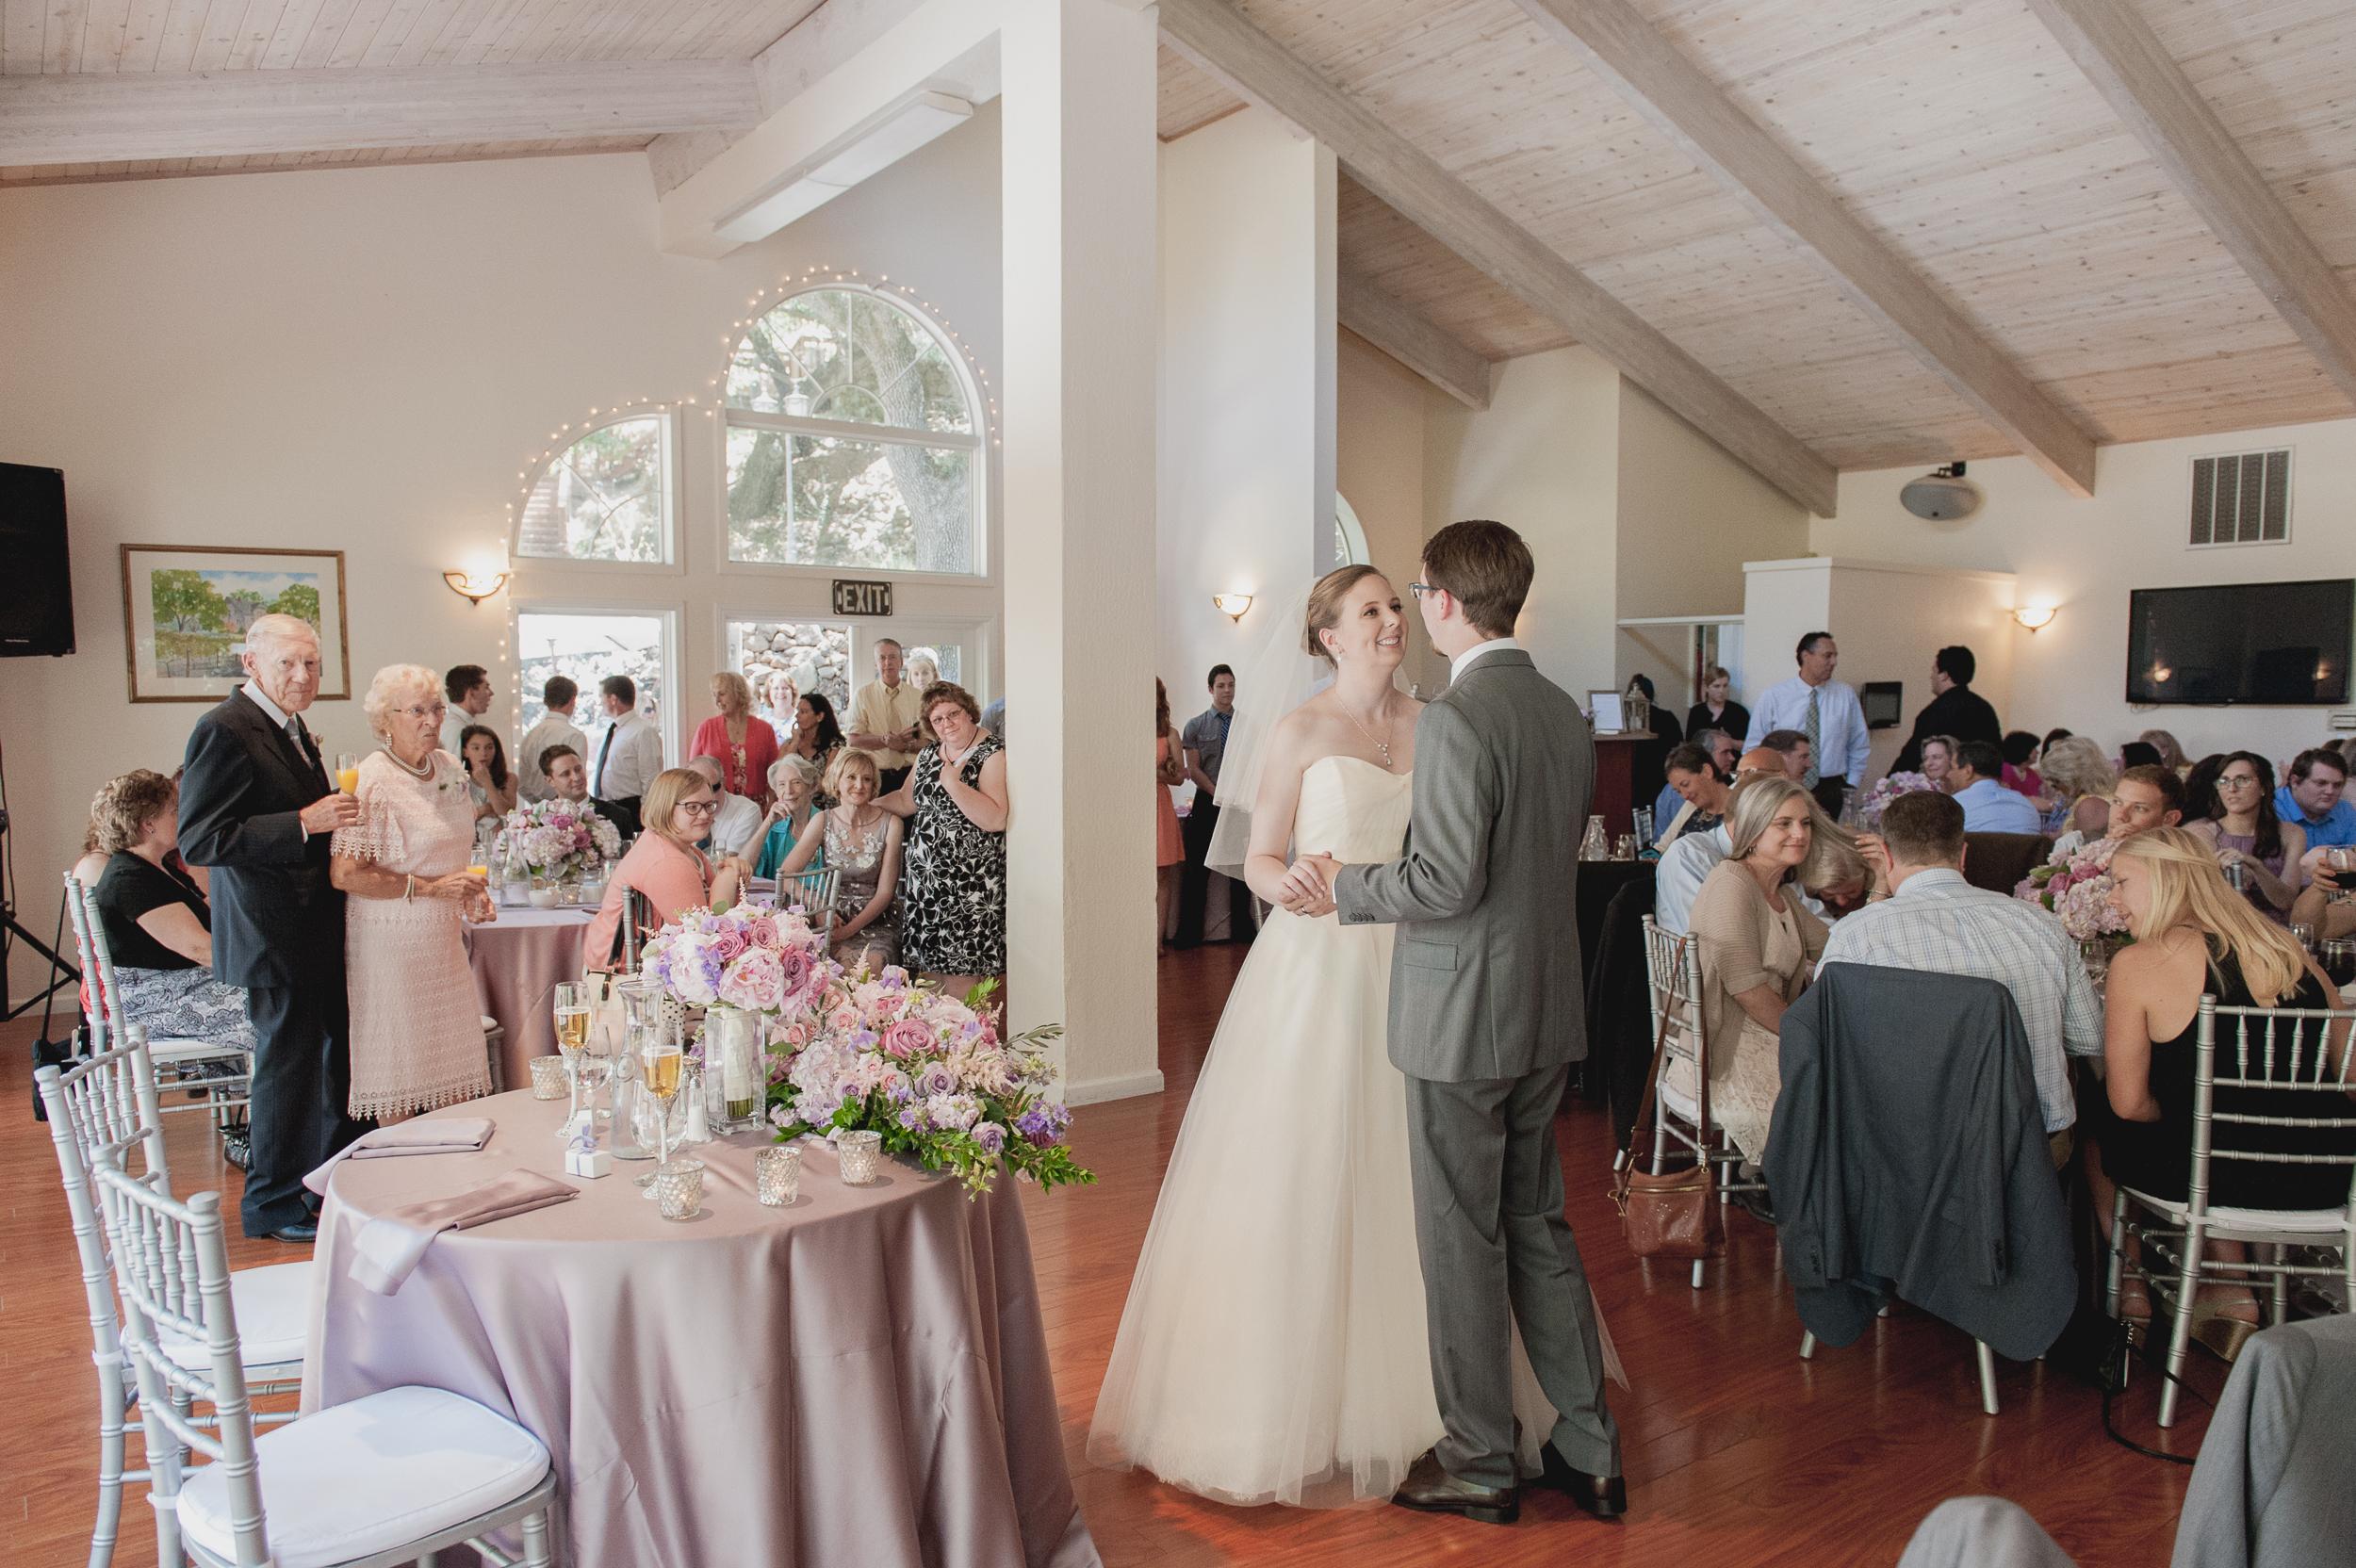 elliston-vineyards-morning-wedding-vivianchen-048.jpg